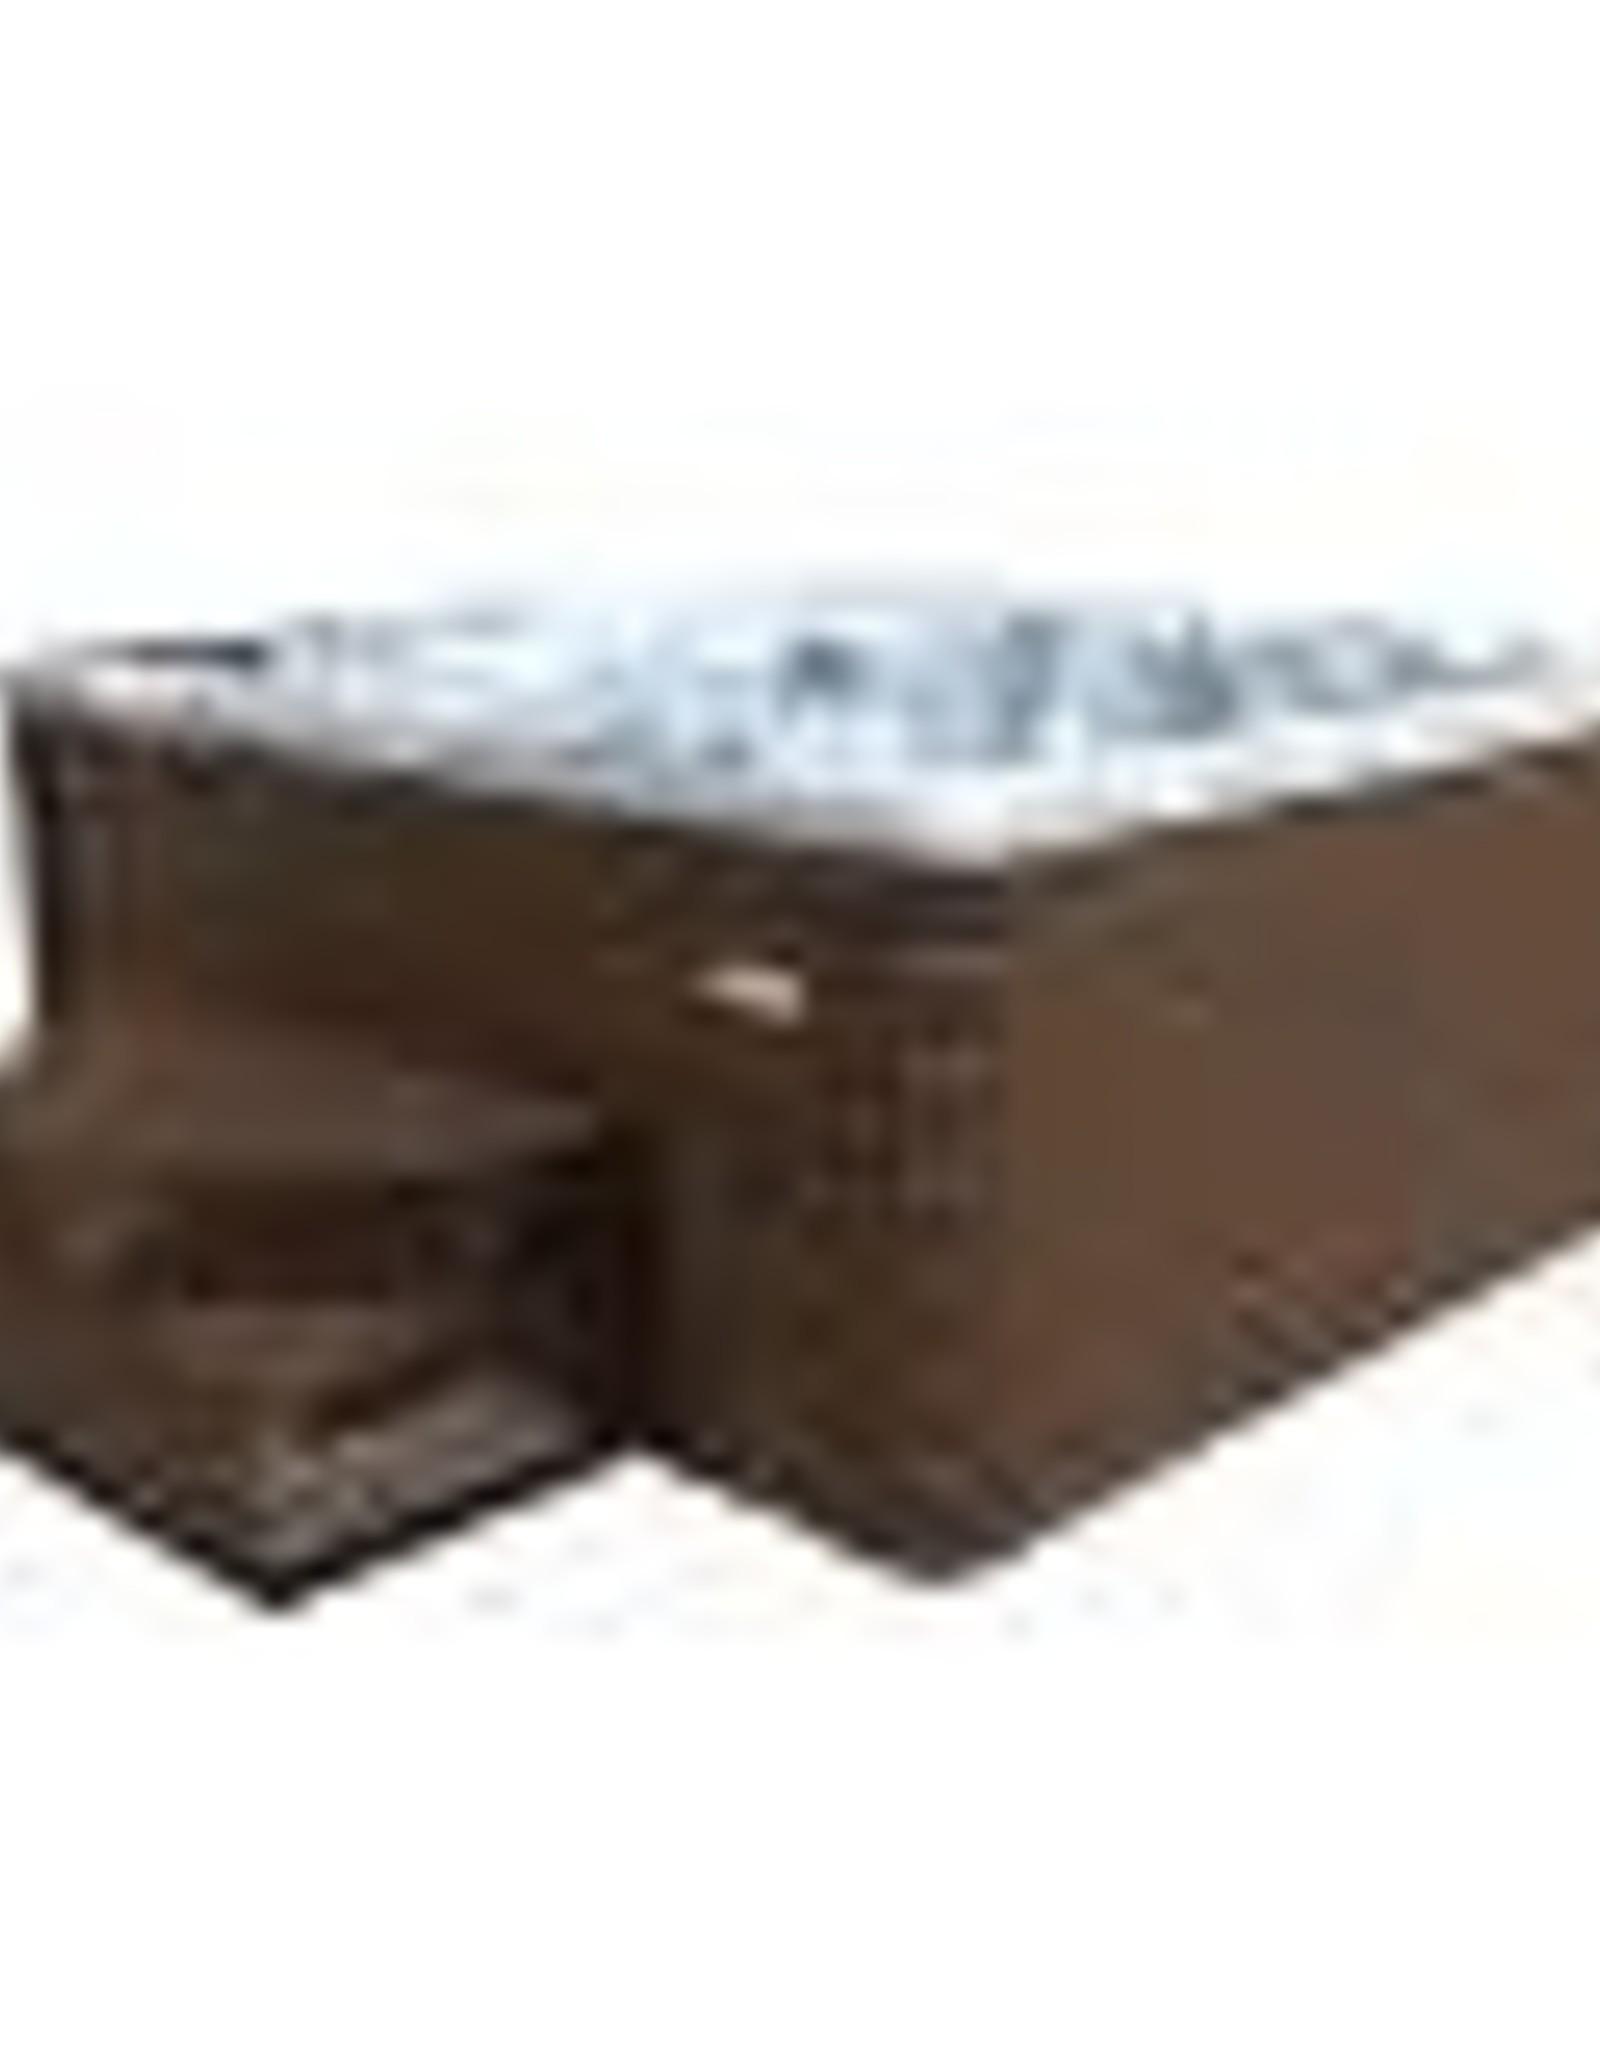 BEACHCOMBER BEACHCOMBER - MODEL 710 HYBRID4®